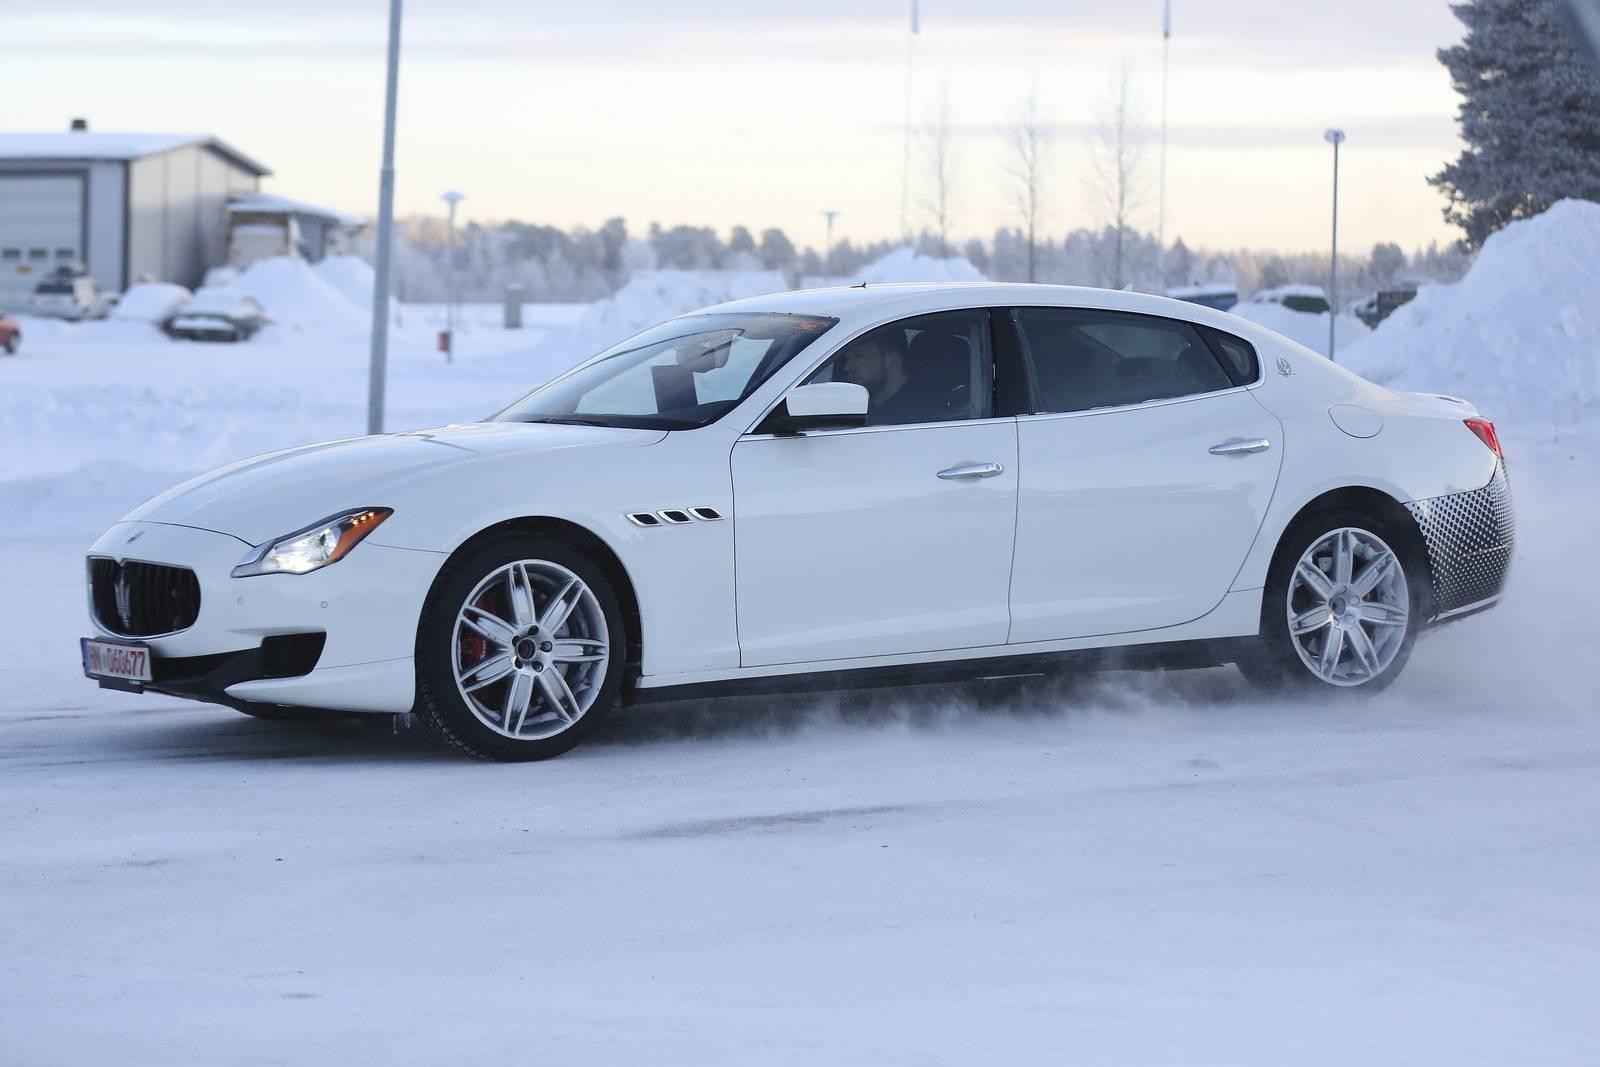 Maserati Ghibli Snow >> Maserati Quattroporte Facelift First Spy Shots - GTspirit